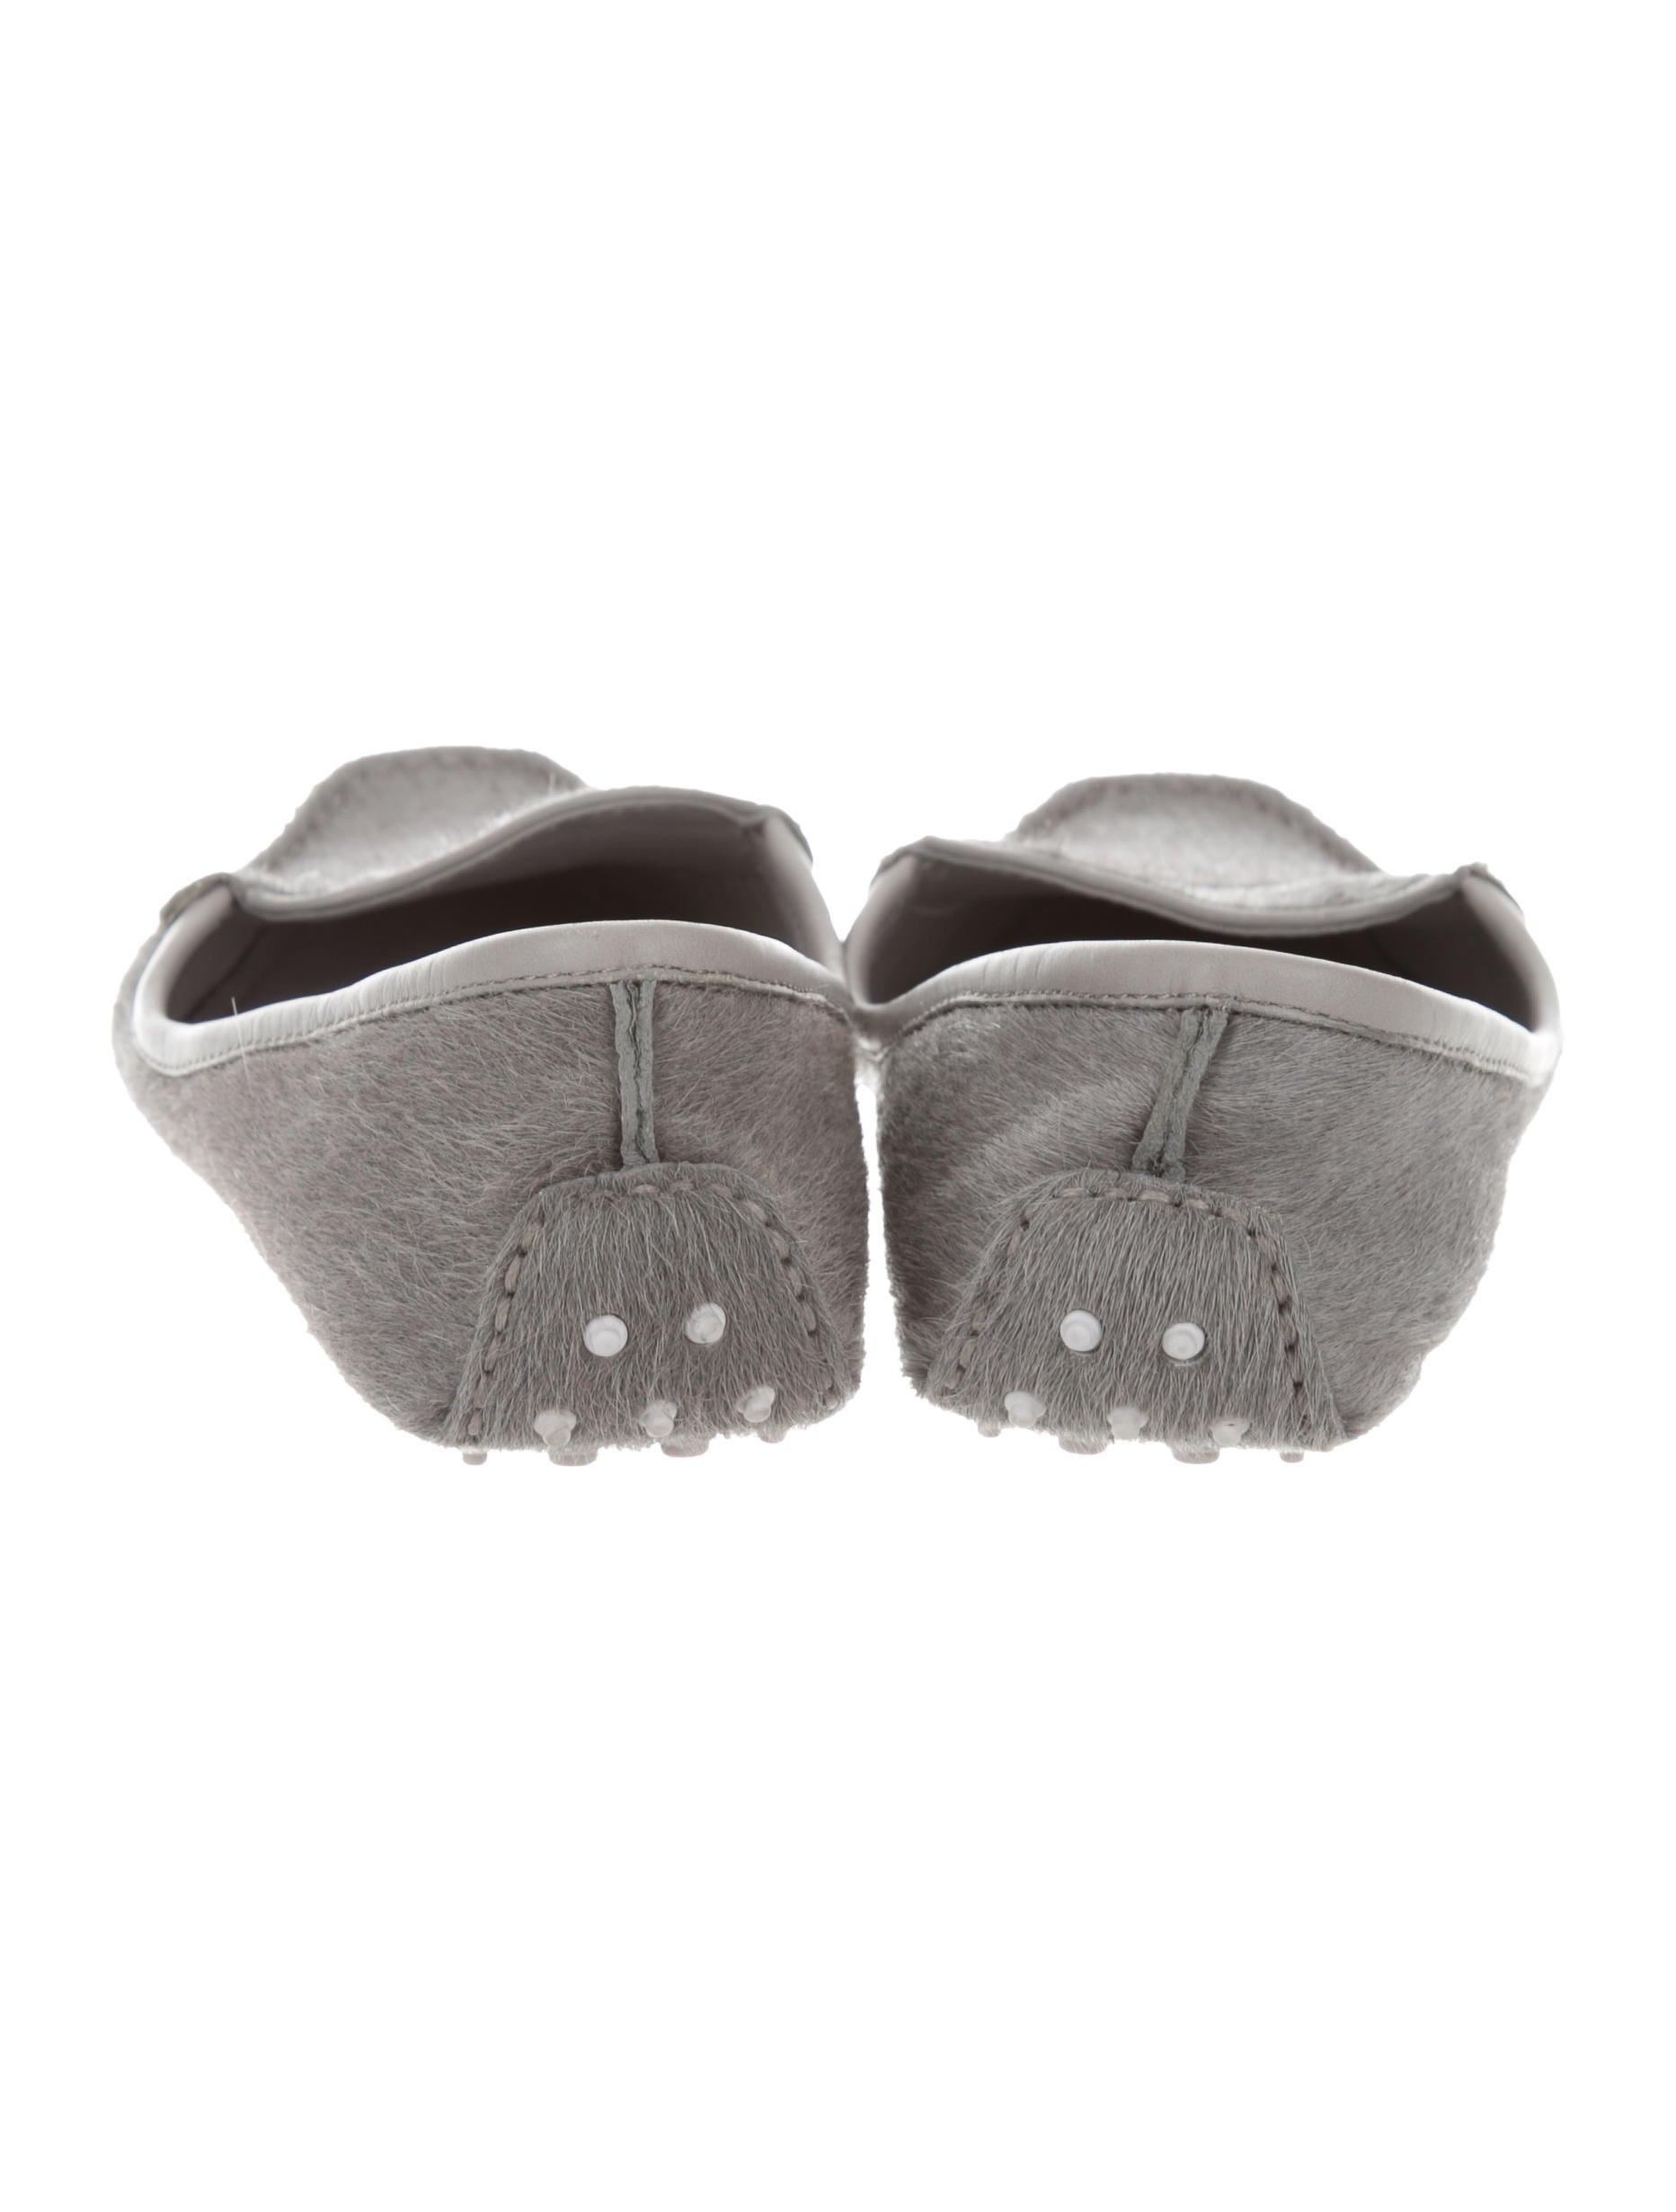 Derek Lam 10 Crosby Ponyhair Square-Toe Loafers tumblr for sale cheap cheap online view online QWt5lQcCbK